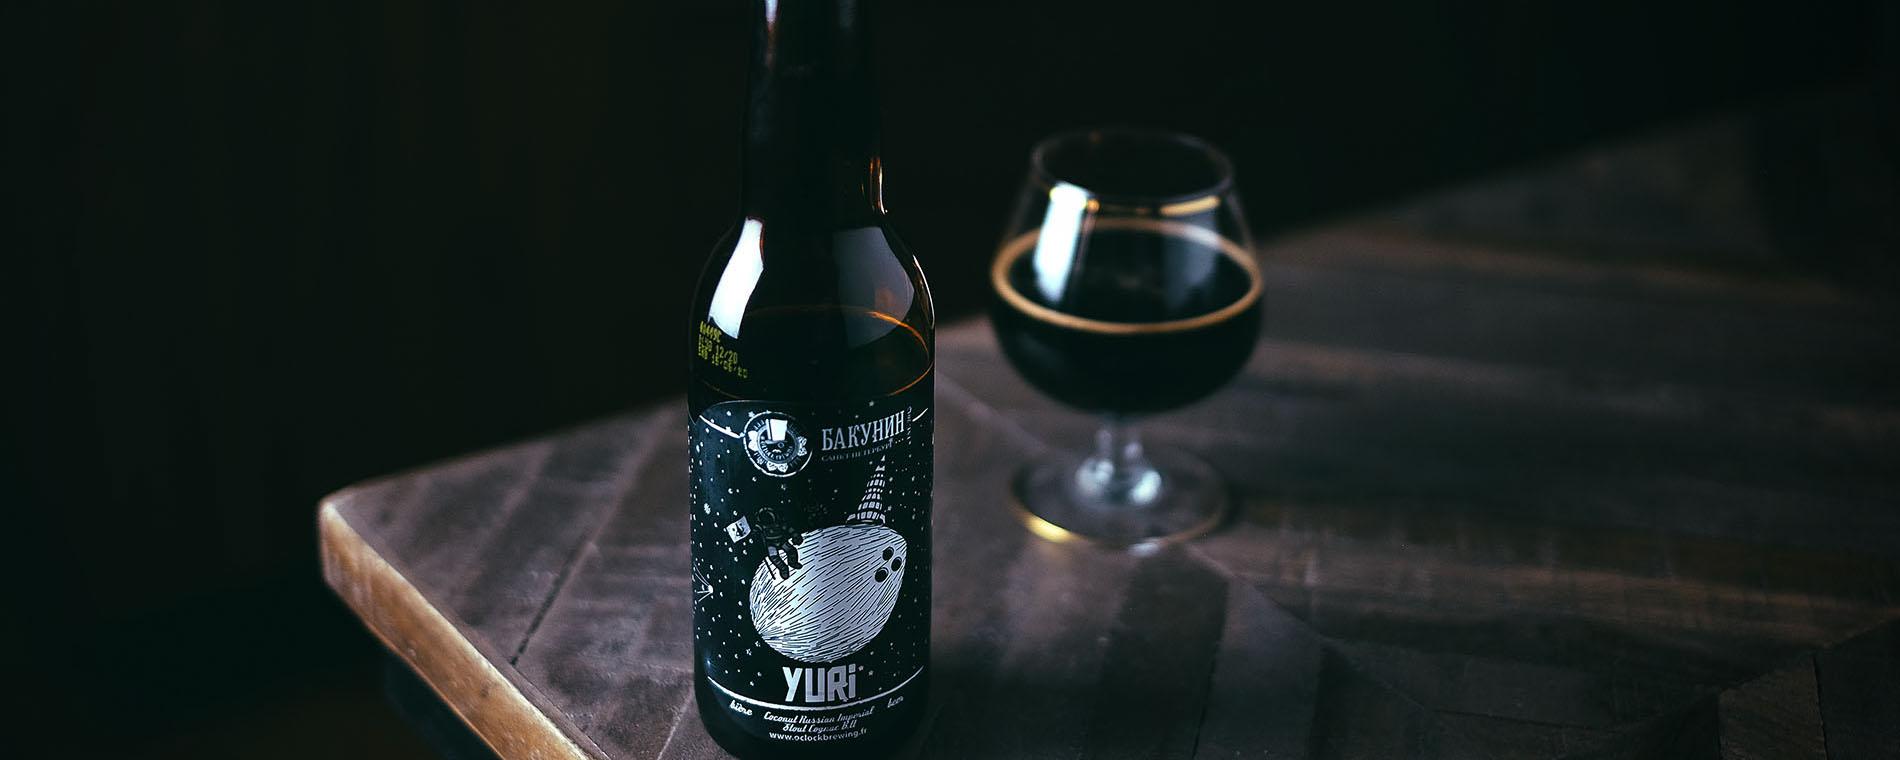 test-biere-oclock-bakunin-yuri-quaff-cover2